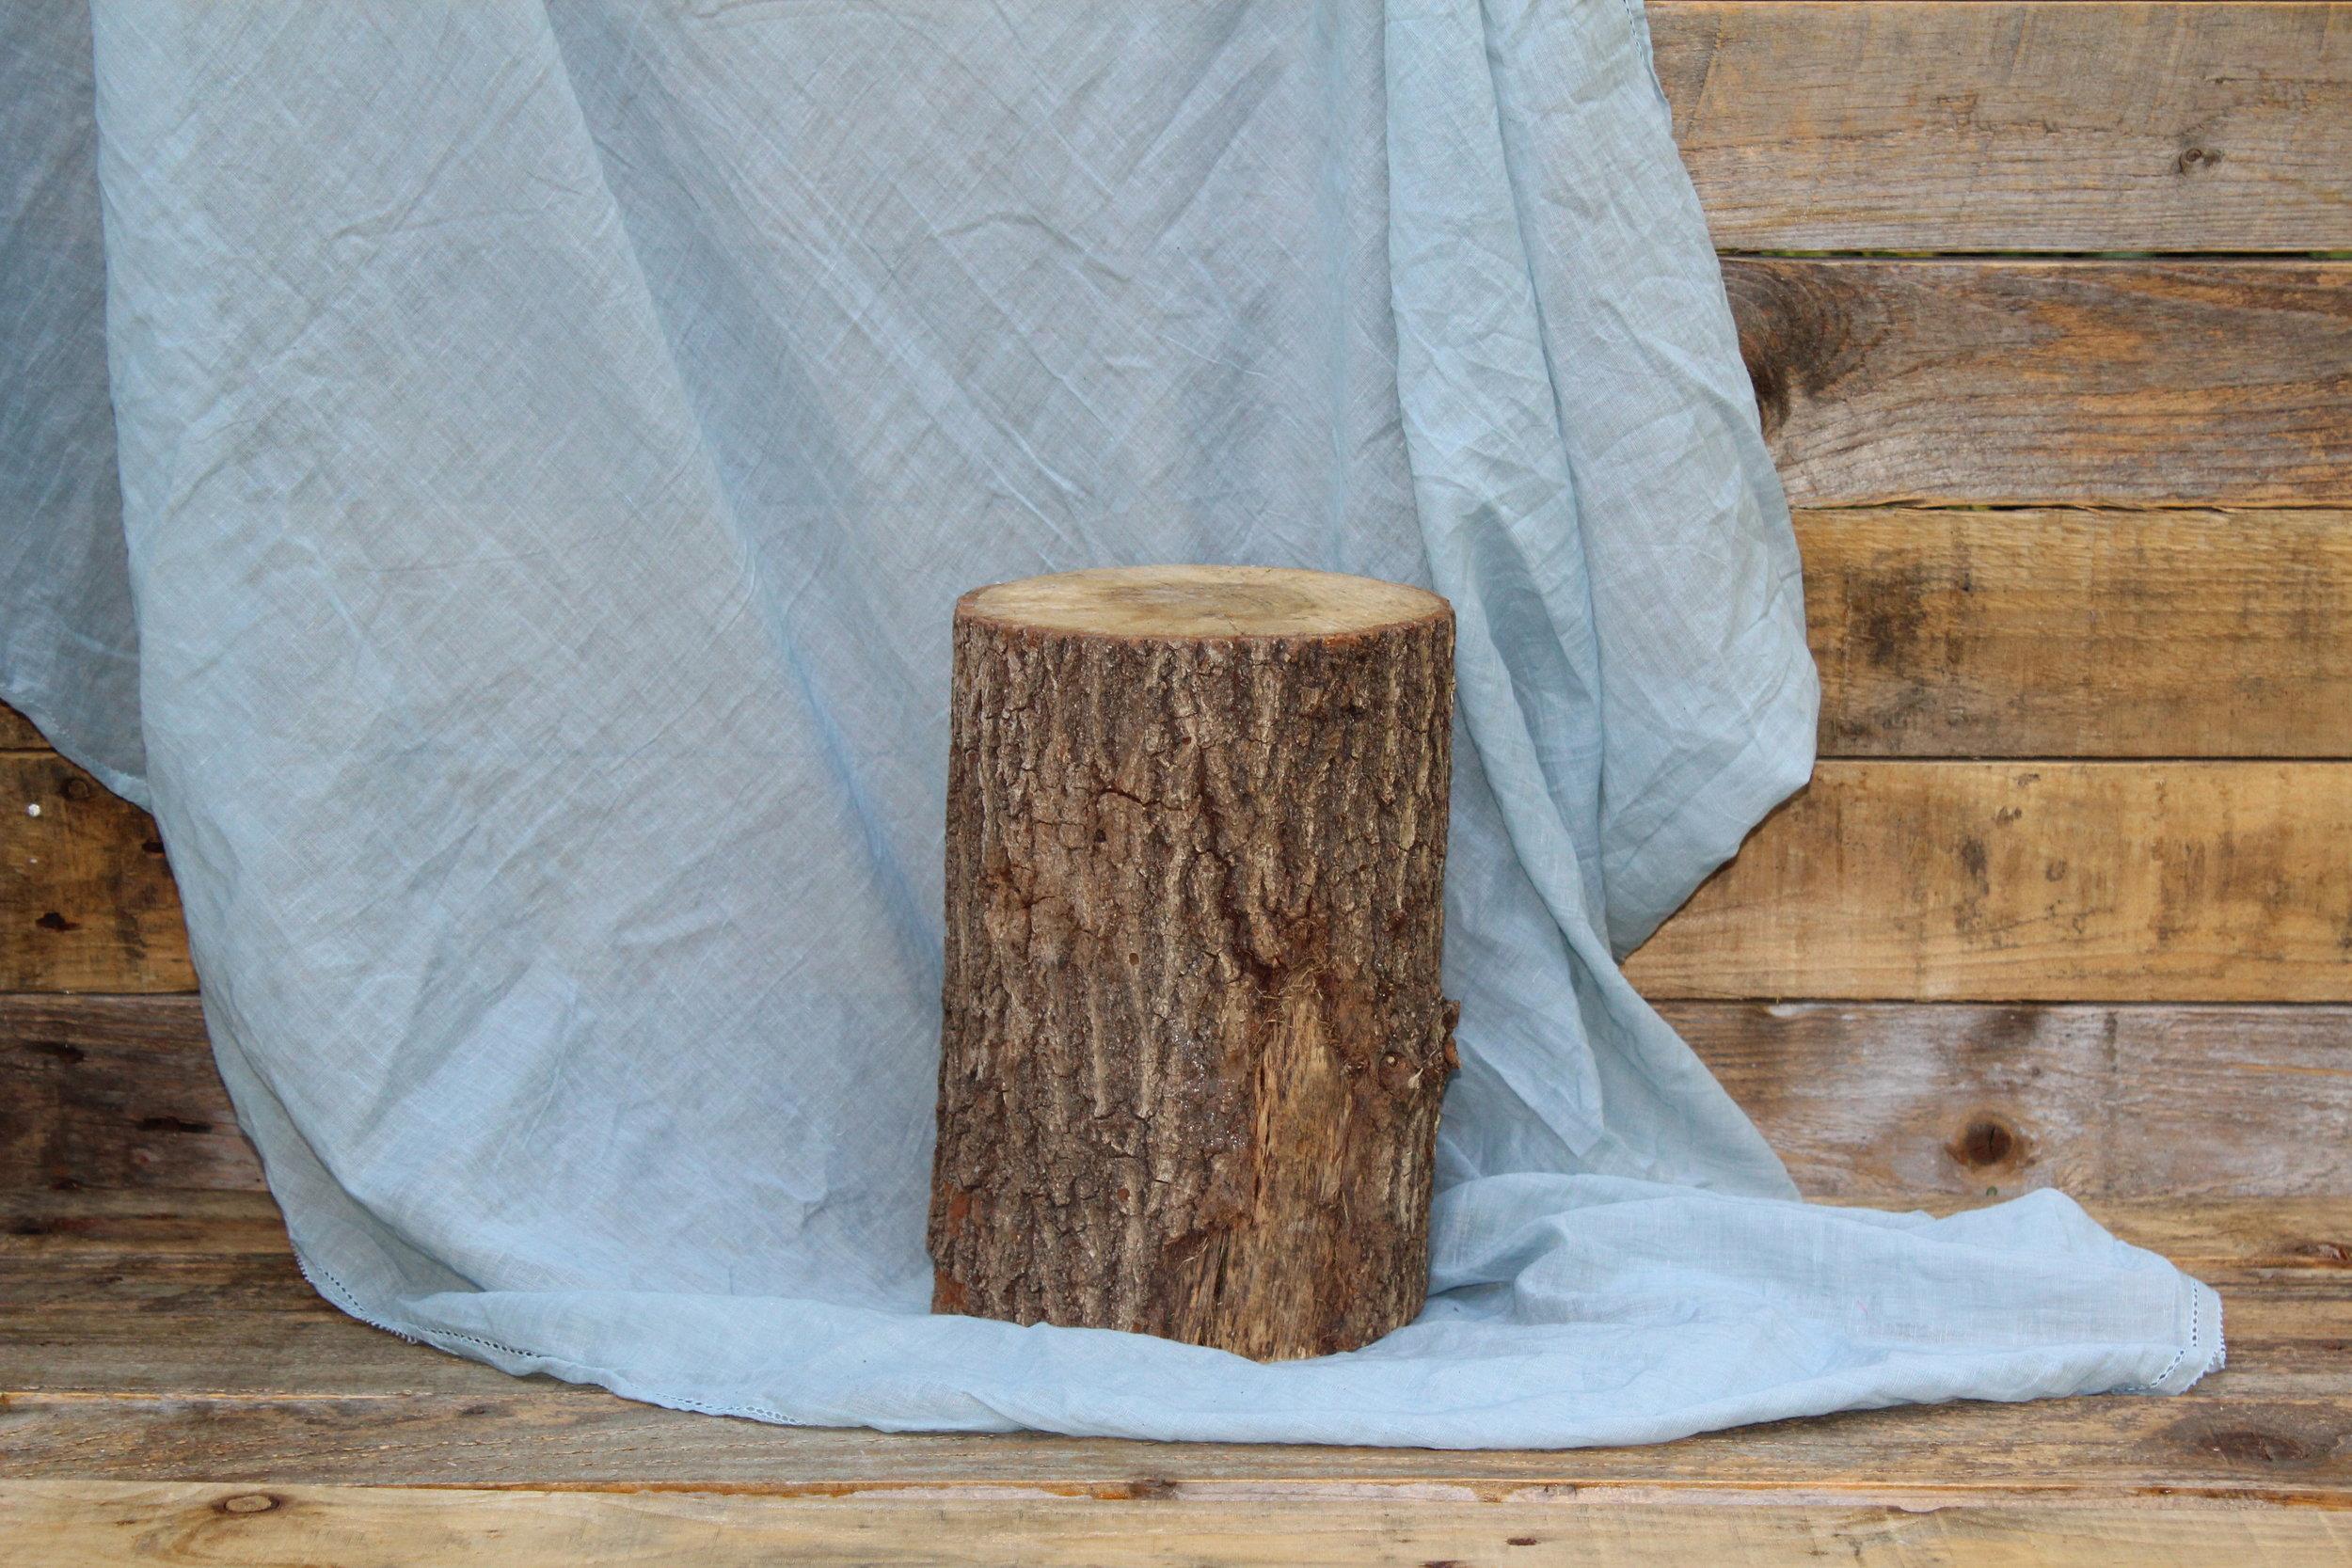 - Mini stump 24cm tall 17cm diameter£5